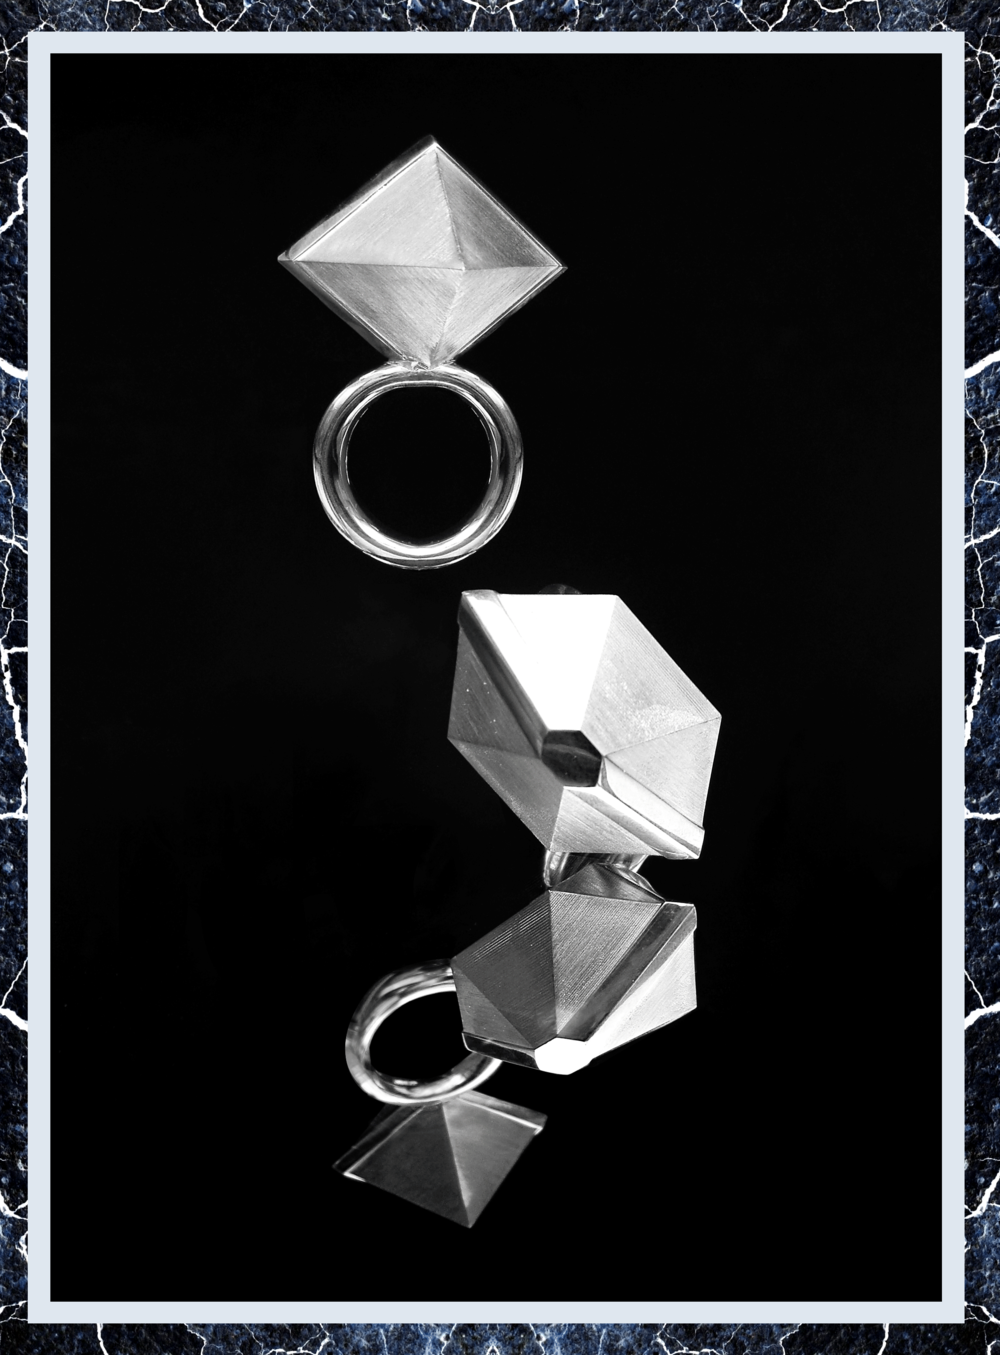 Simone-Brewster-largcrystal--cuboid-silver-id2.png